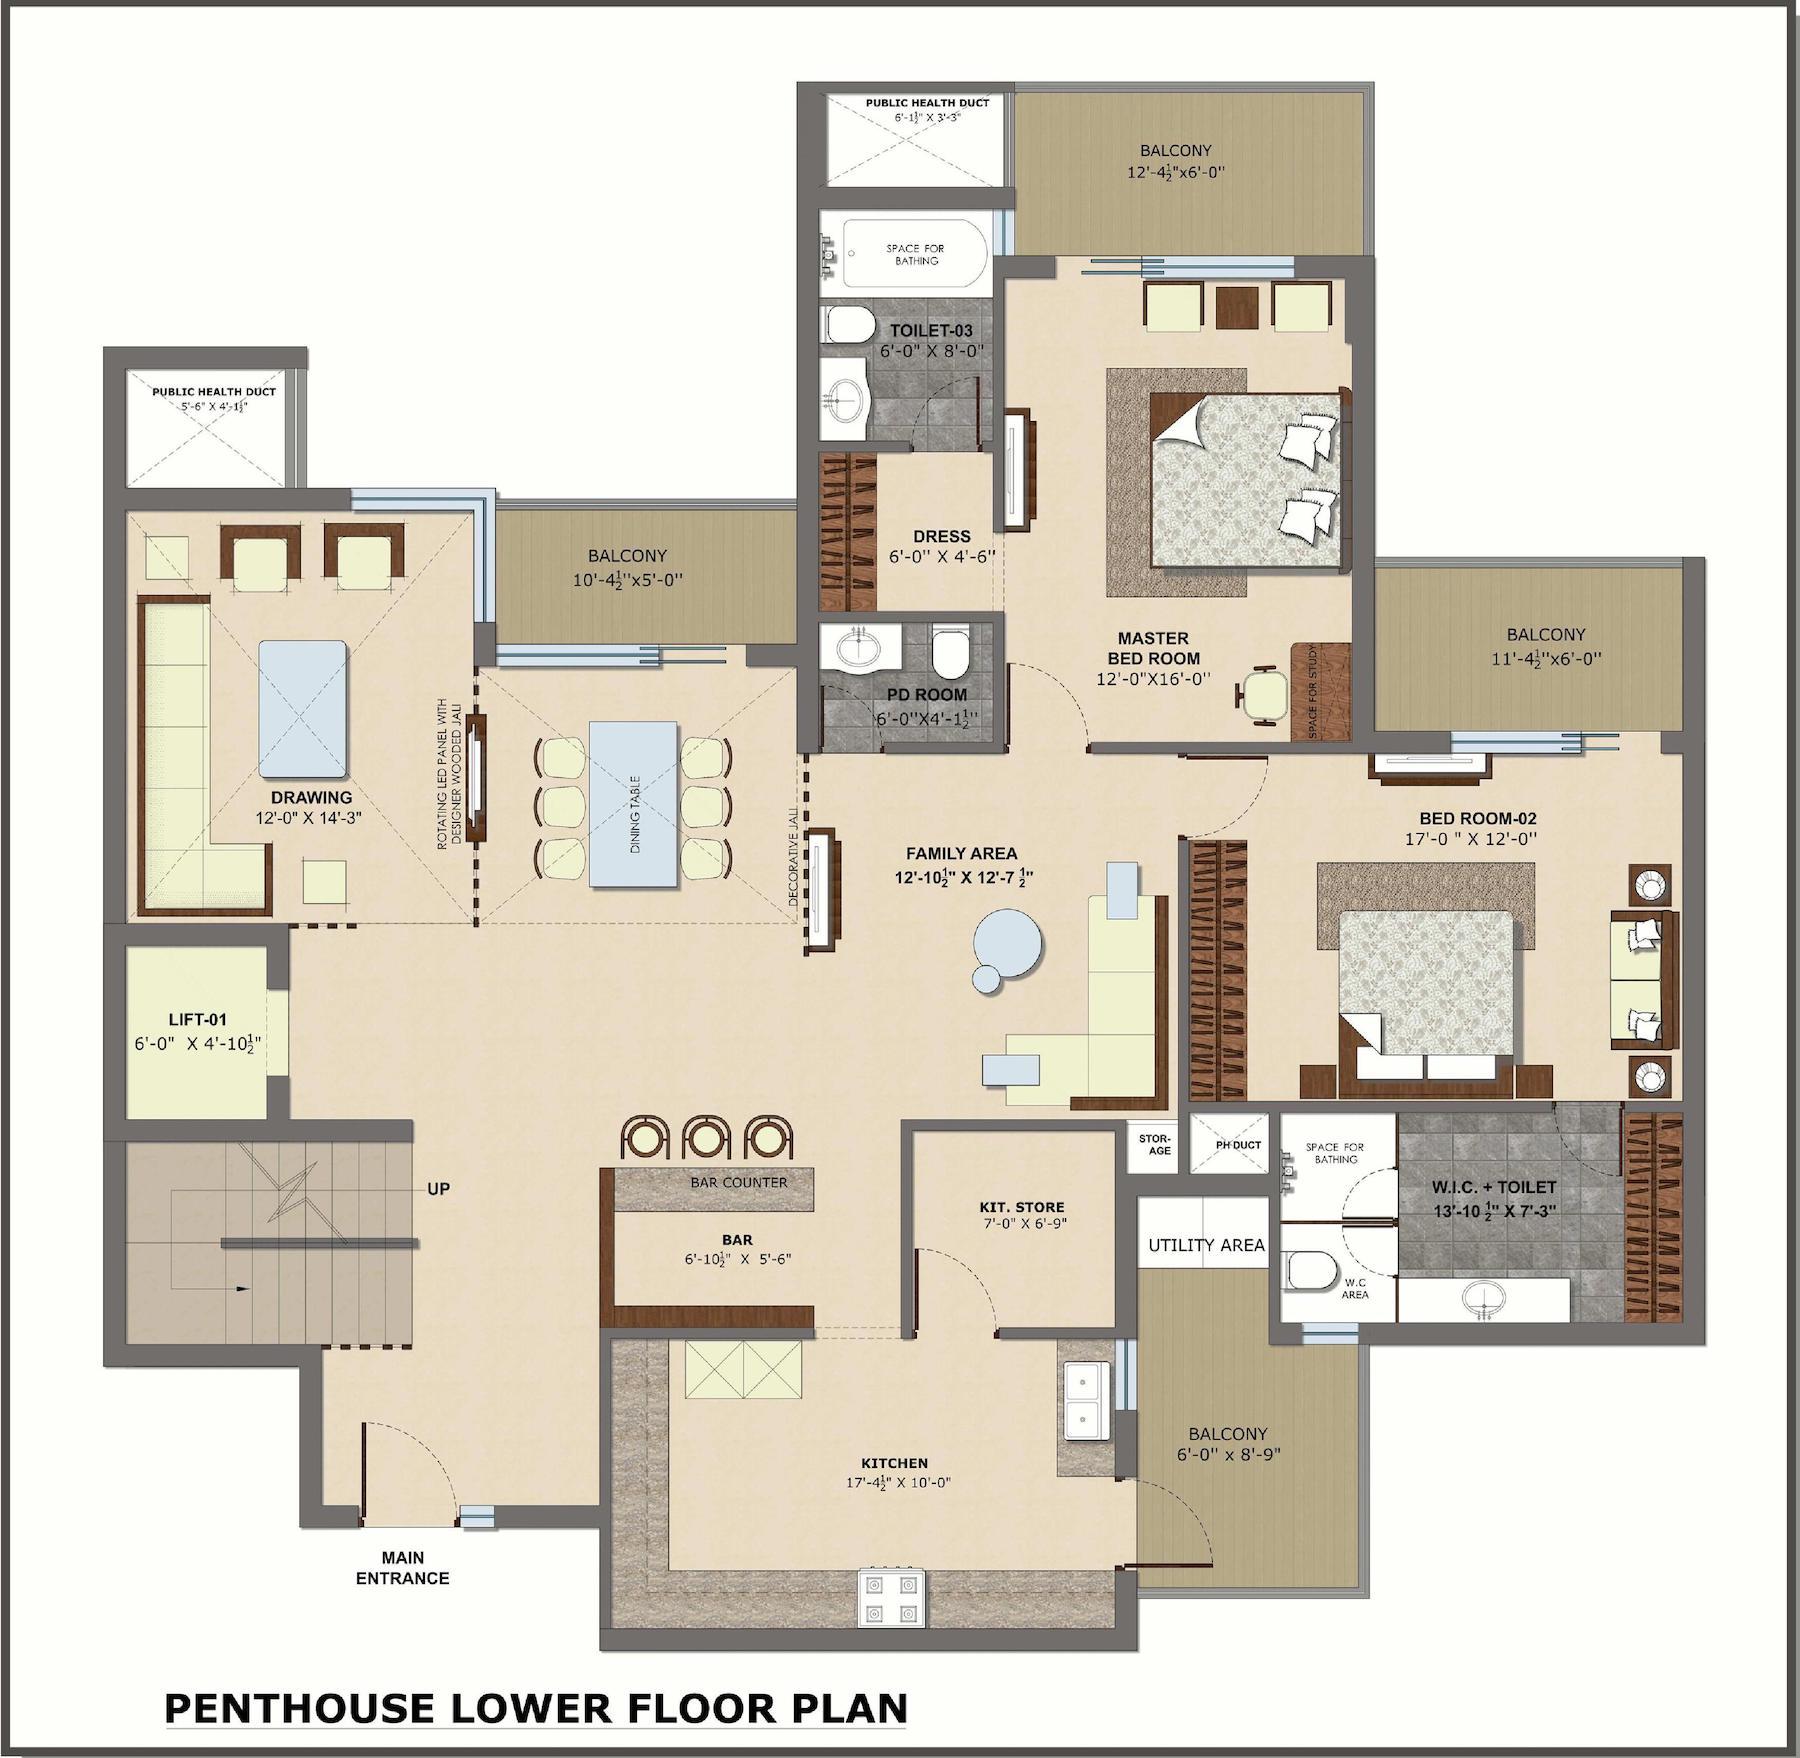 Penthouse, LowerFloor